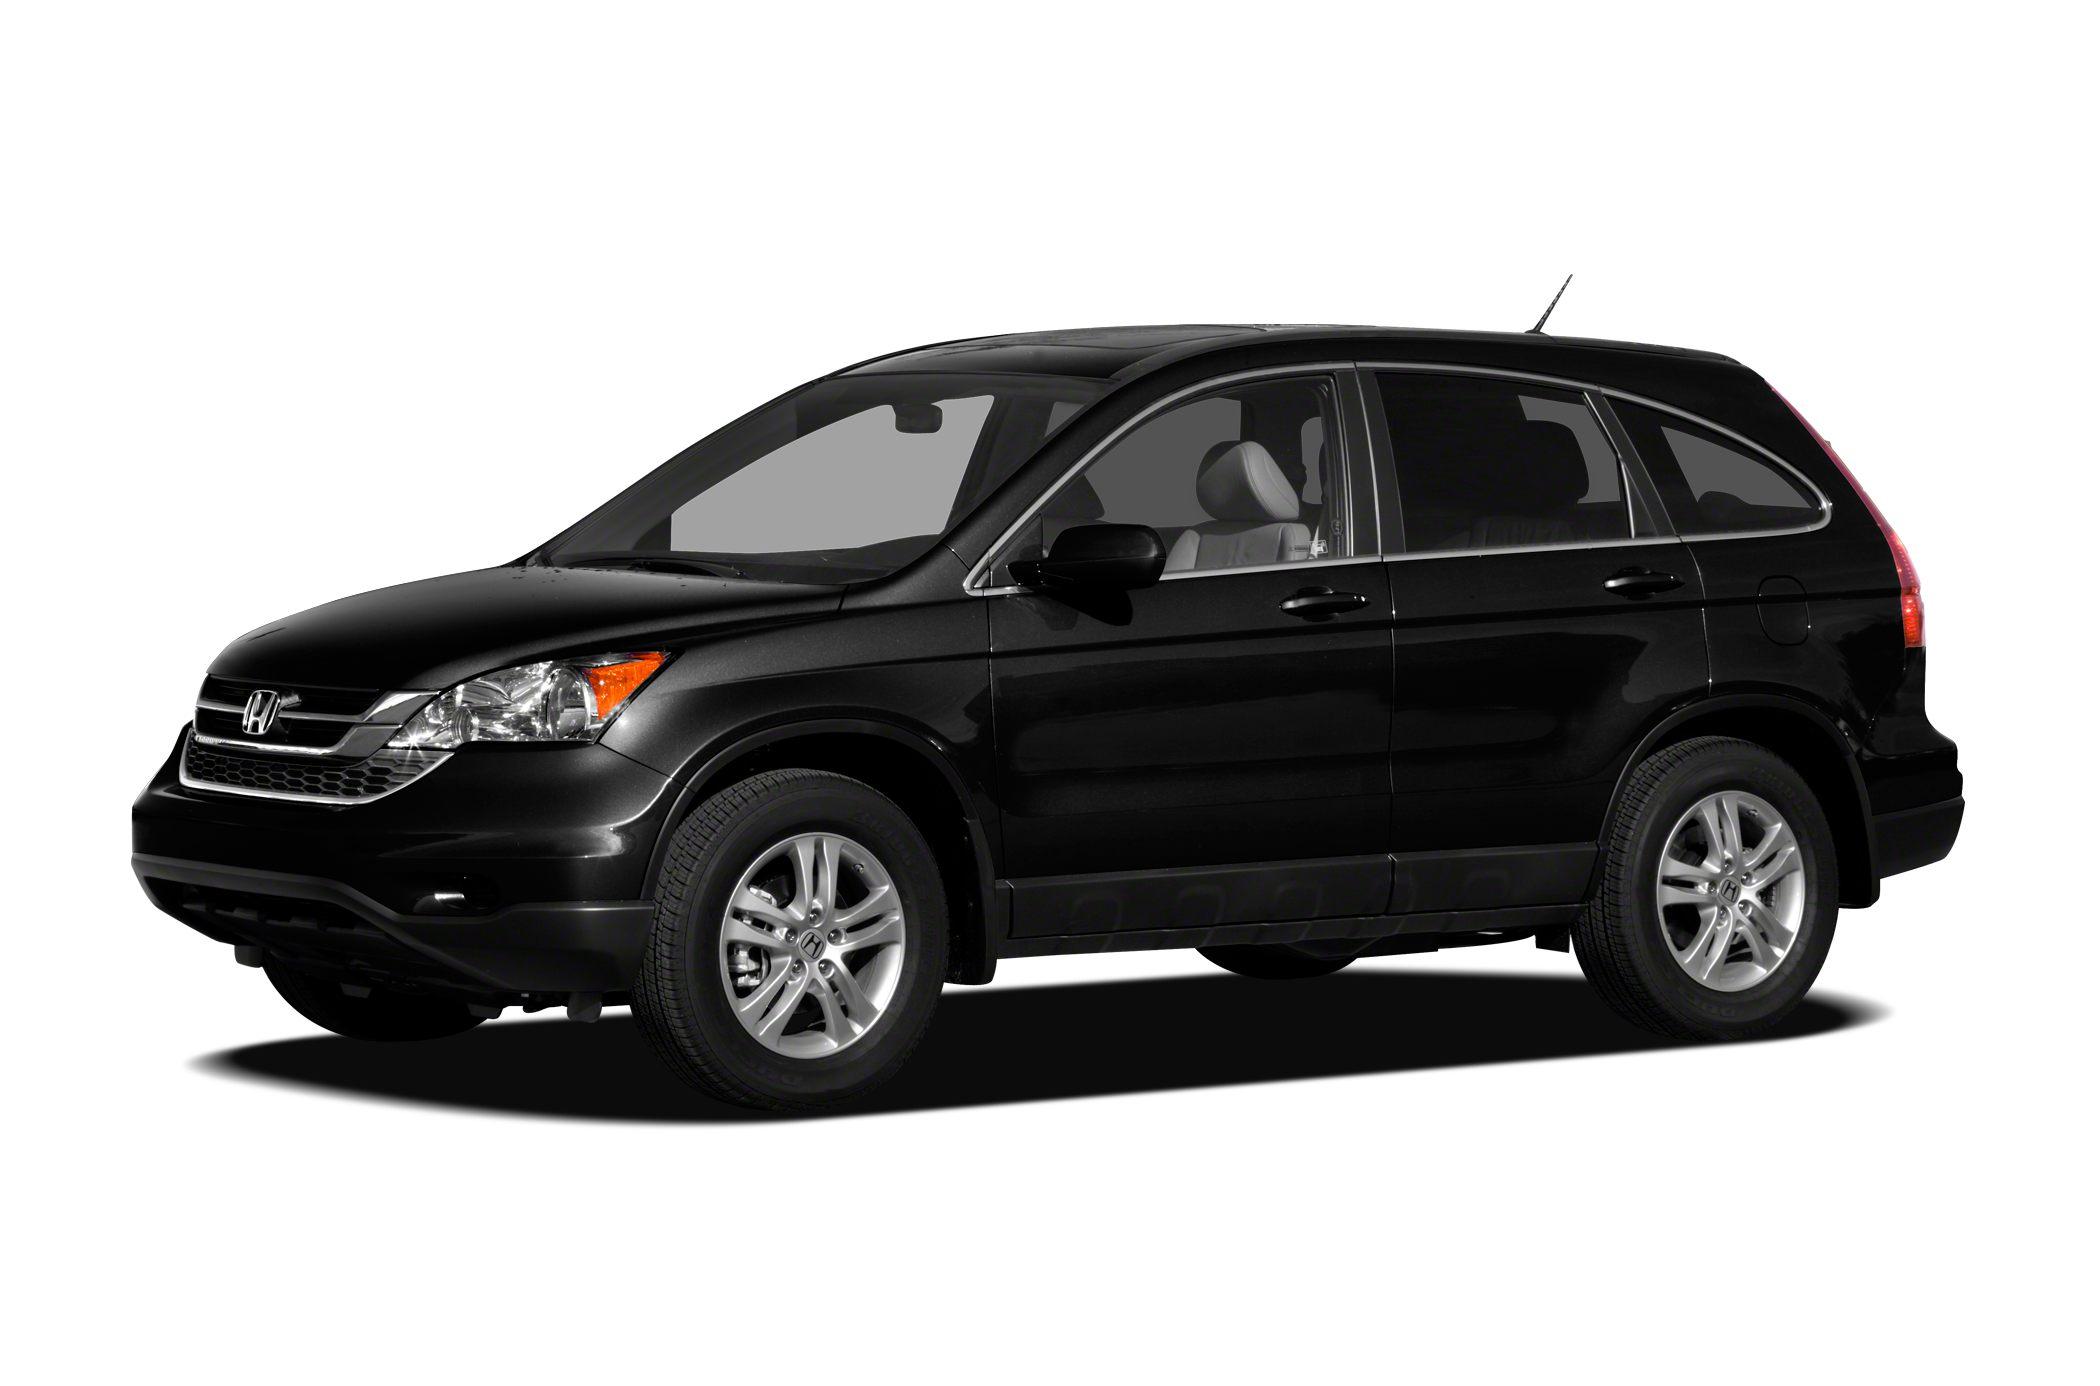 See 2011 Honda Cr V Color Options Carsdirect